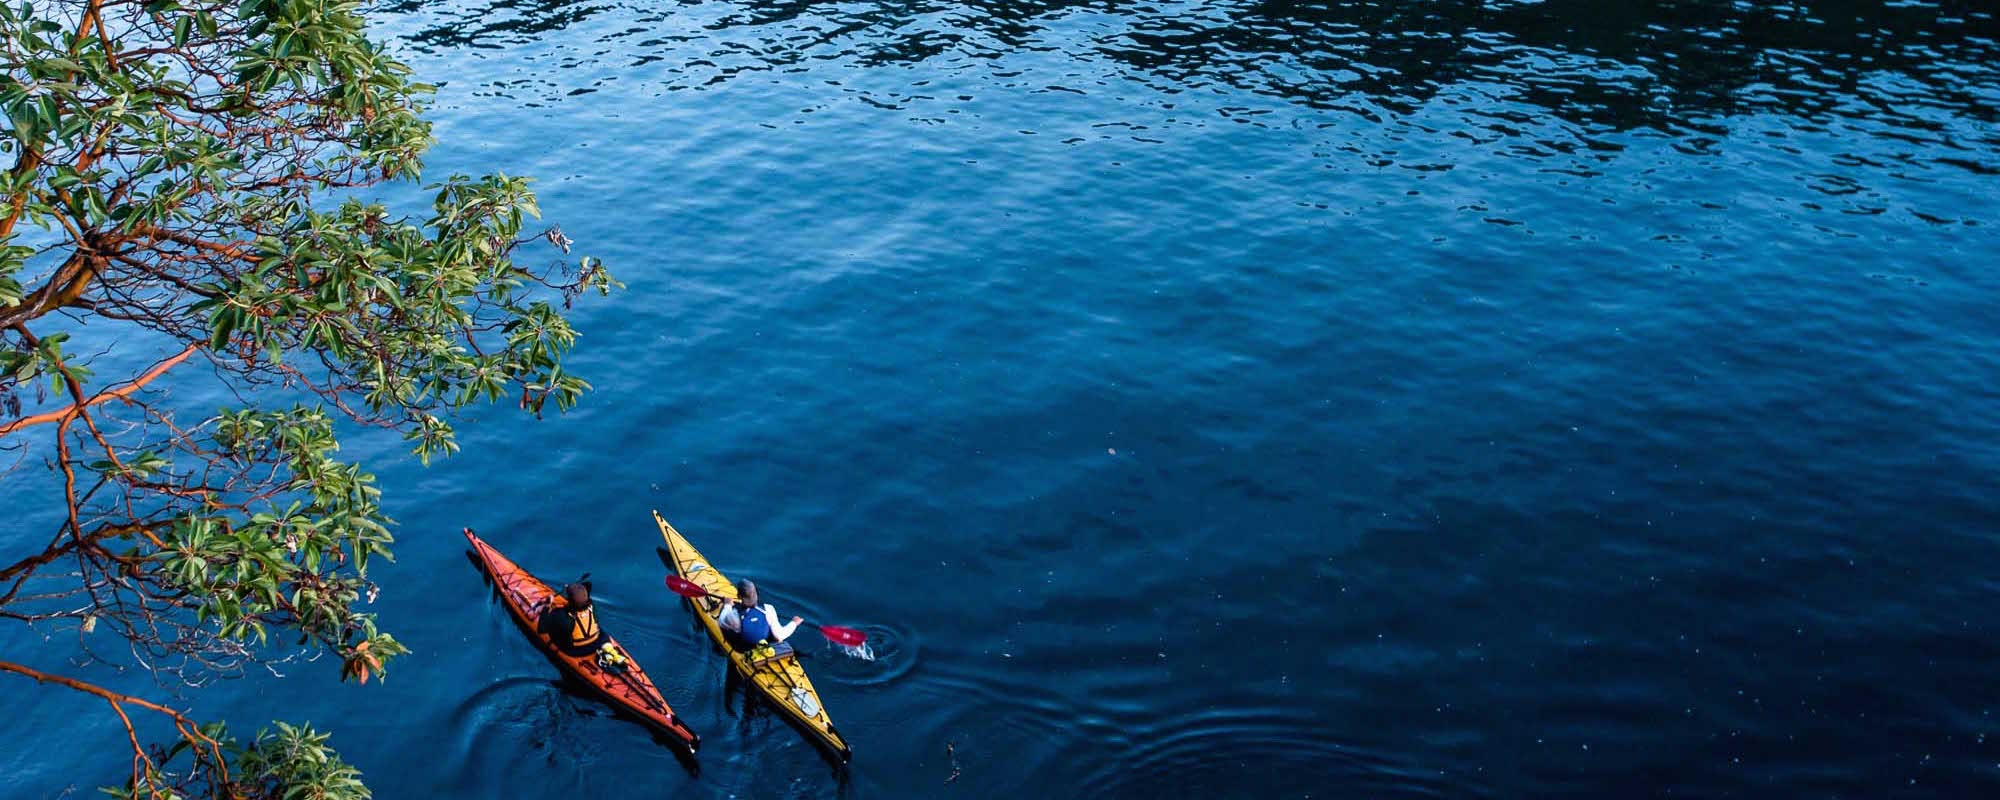 kayak tours around southern gulf islands led by  Pender Island Kayak Adventures team